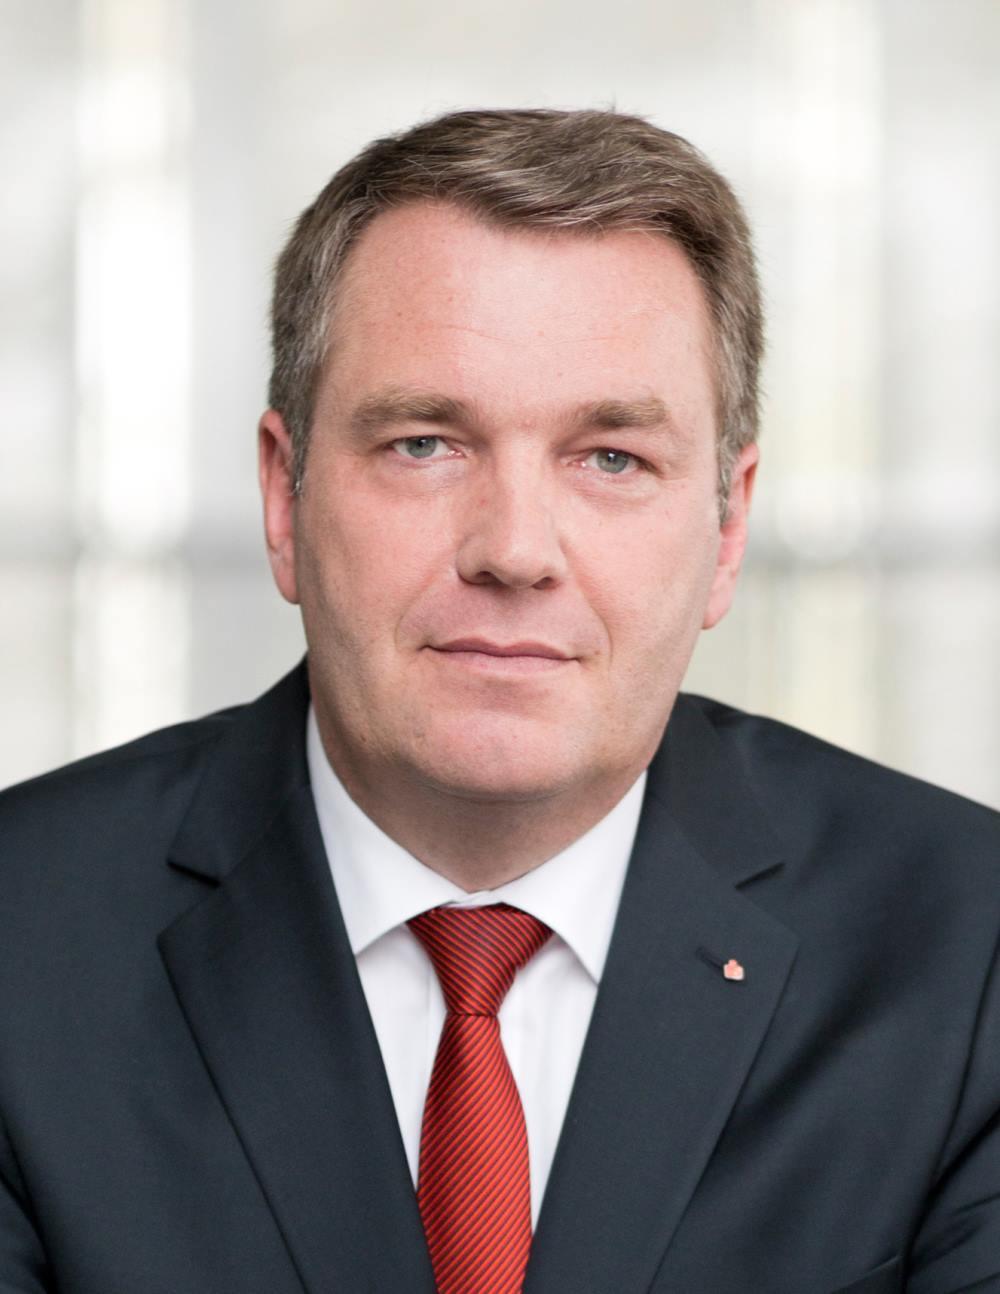 Hr_Linnebank